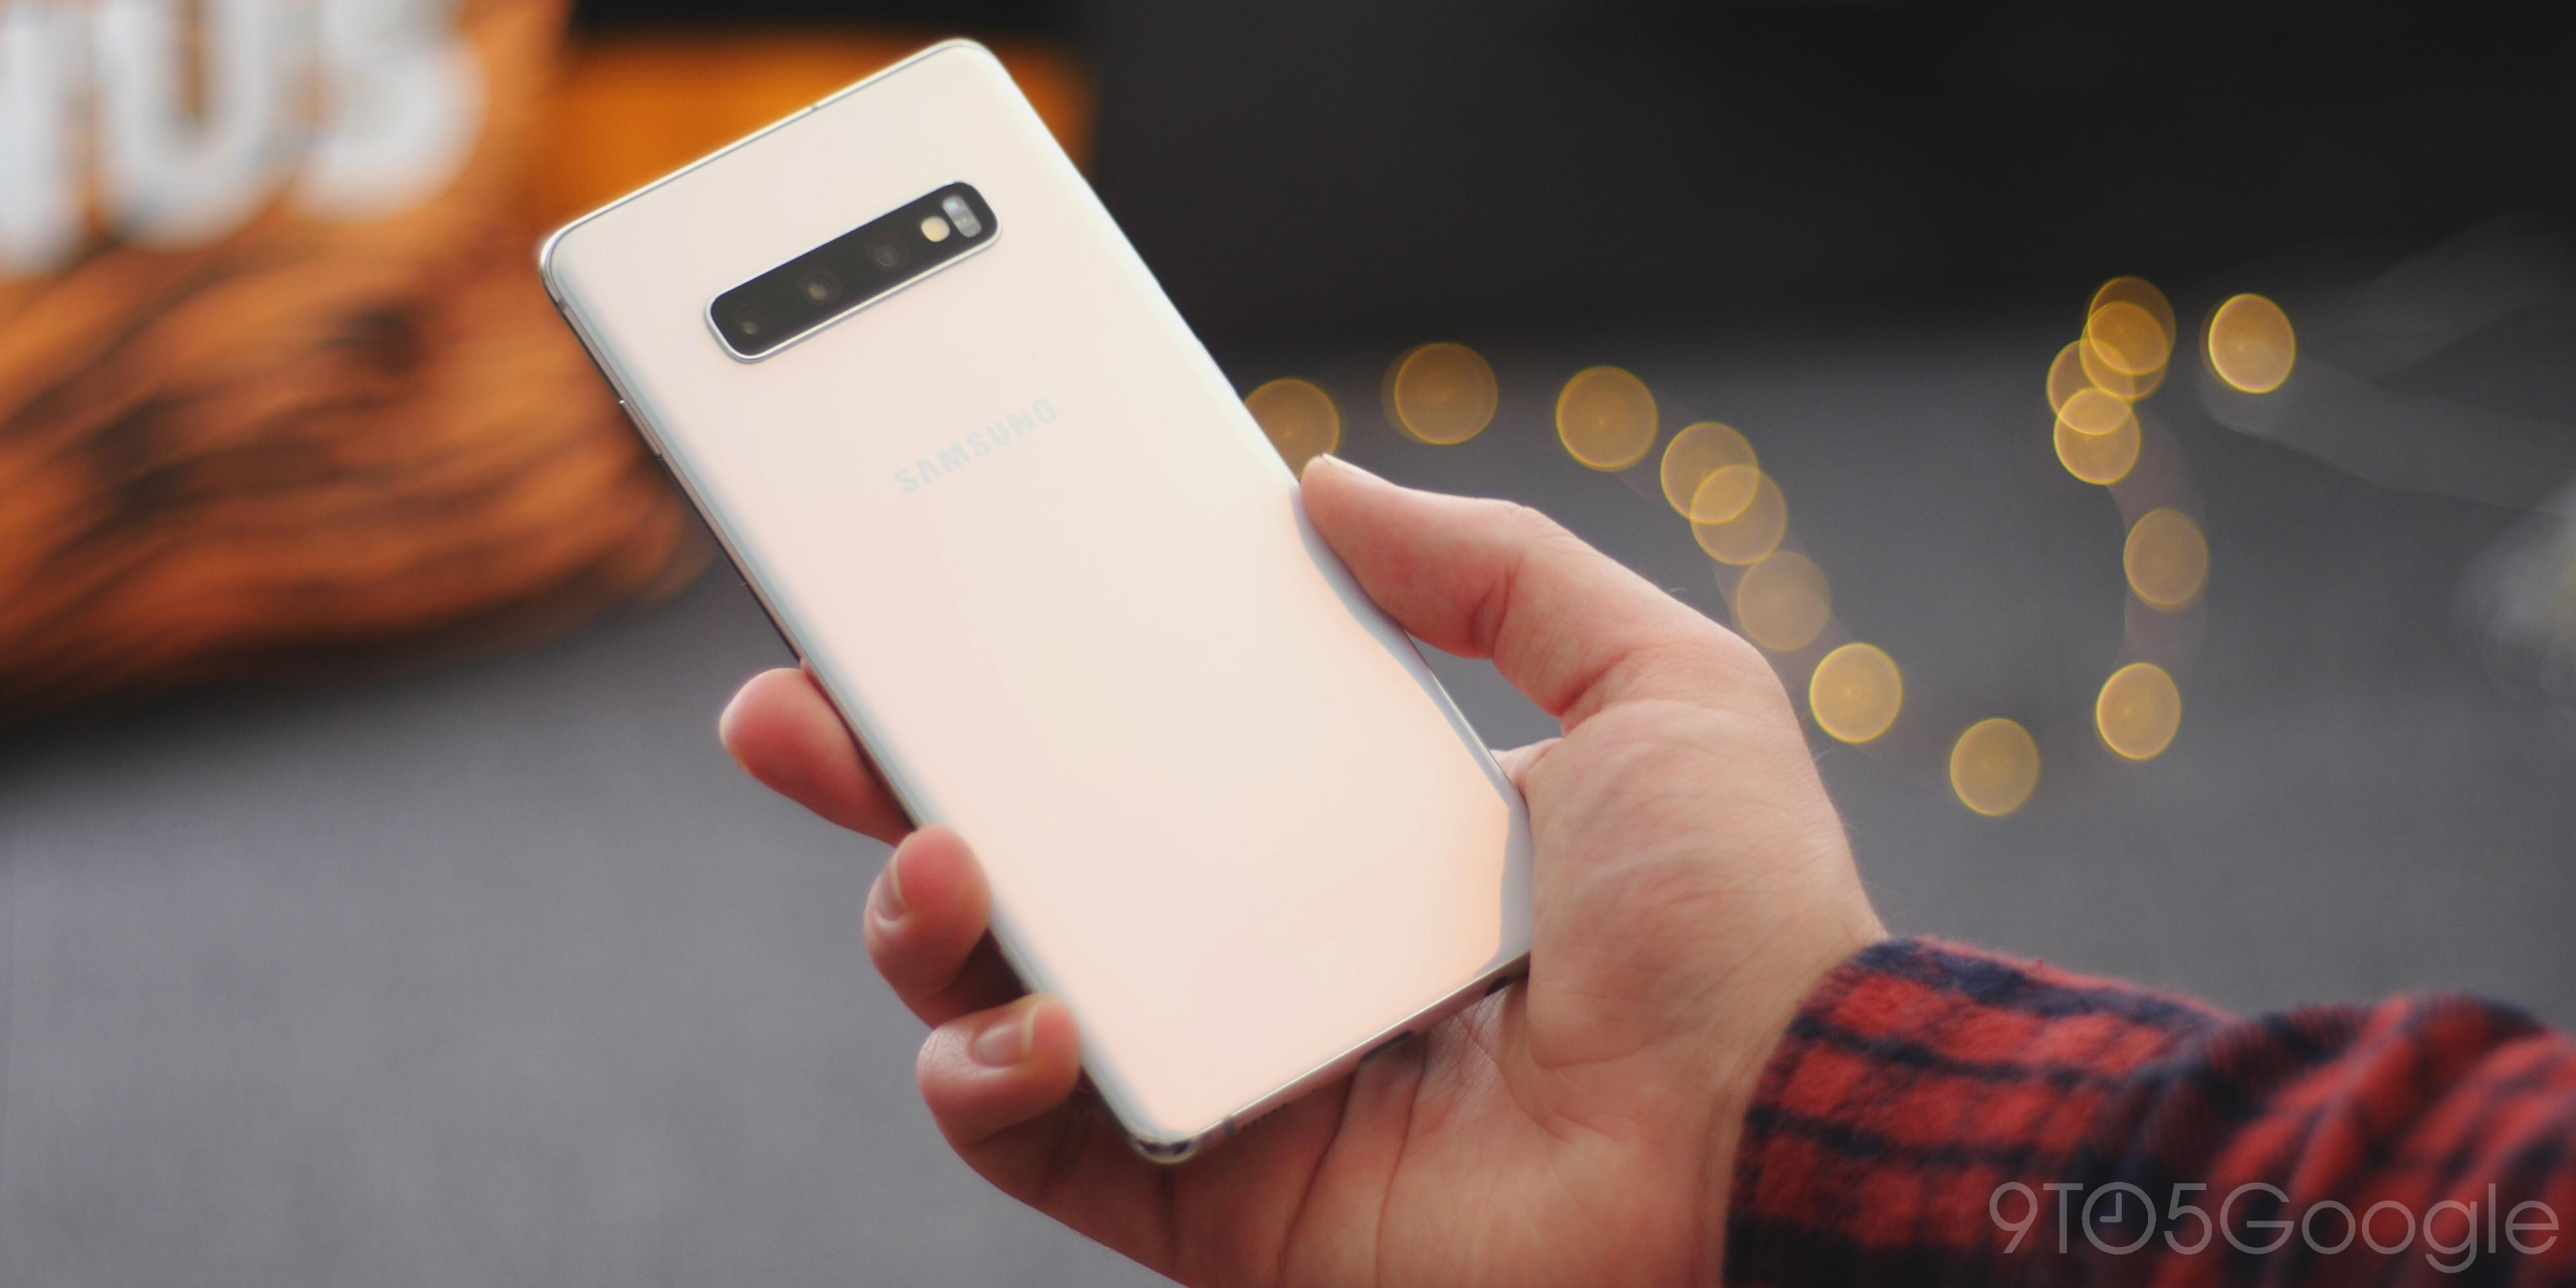 Samsung Galaxy S10+ design